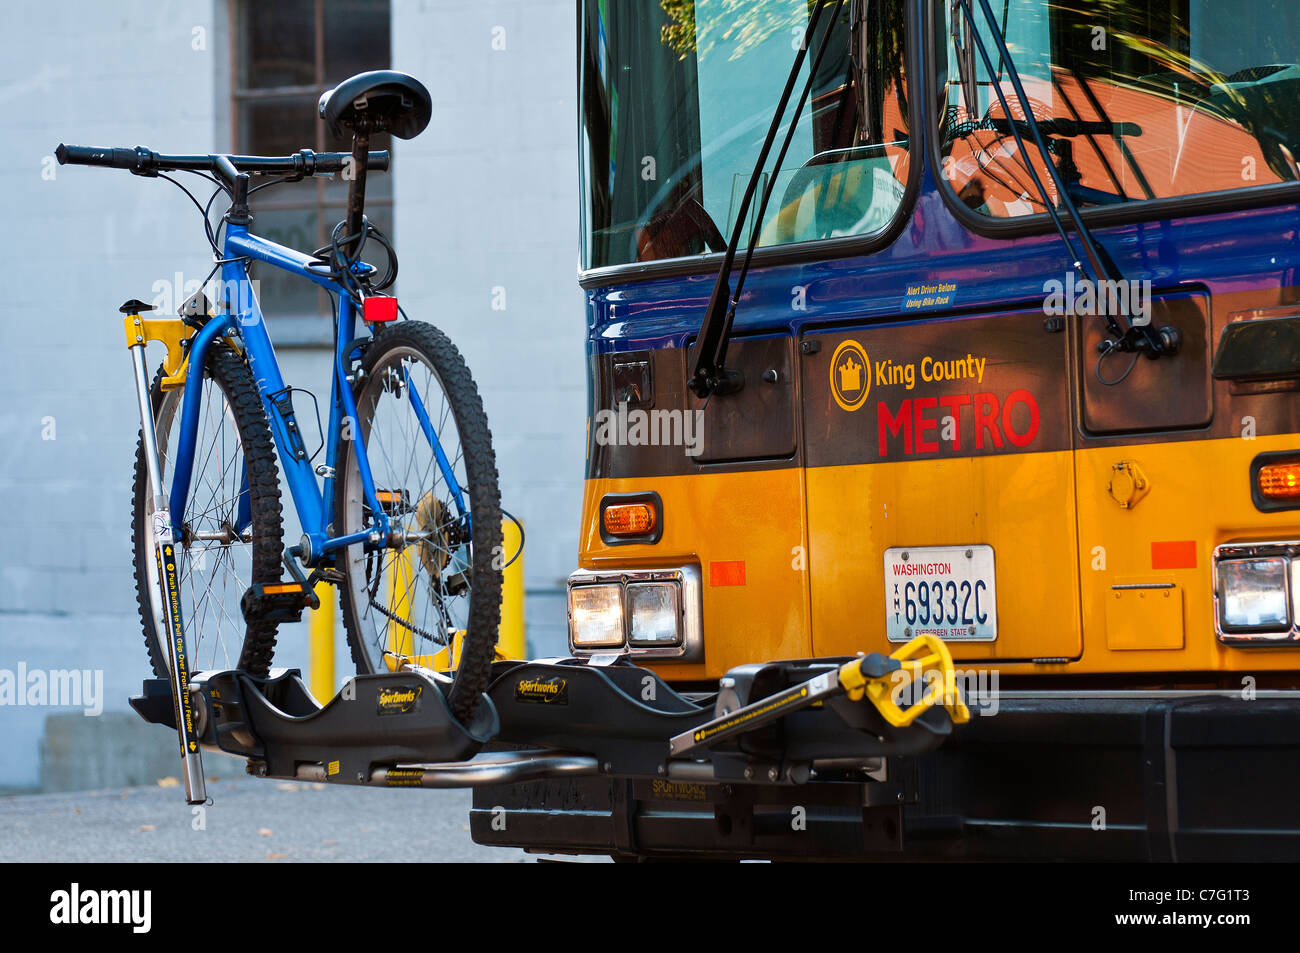 Bike rack in front of public bus, Seattle, Washington, USA - Stock Image